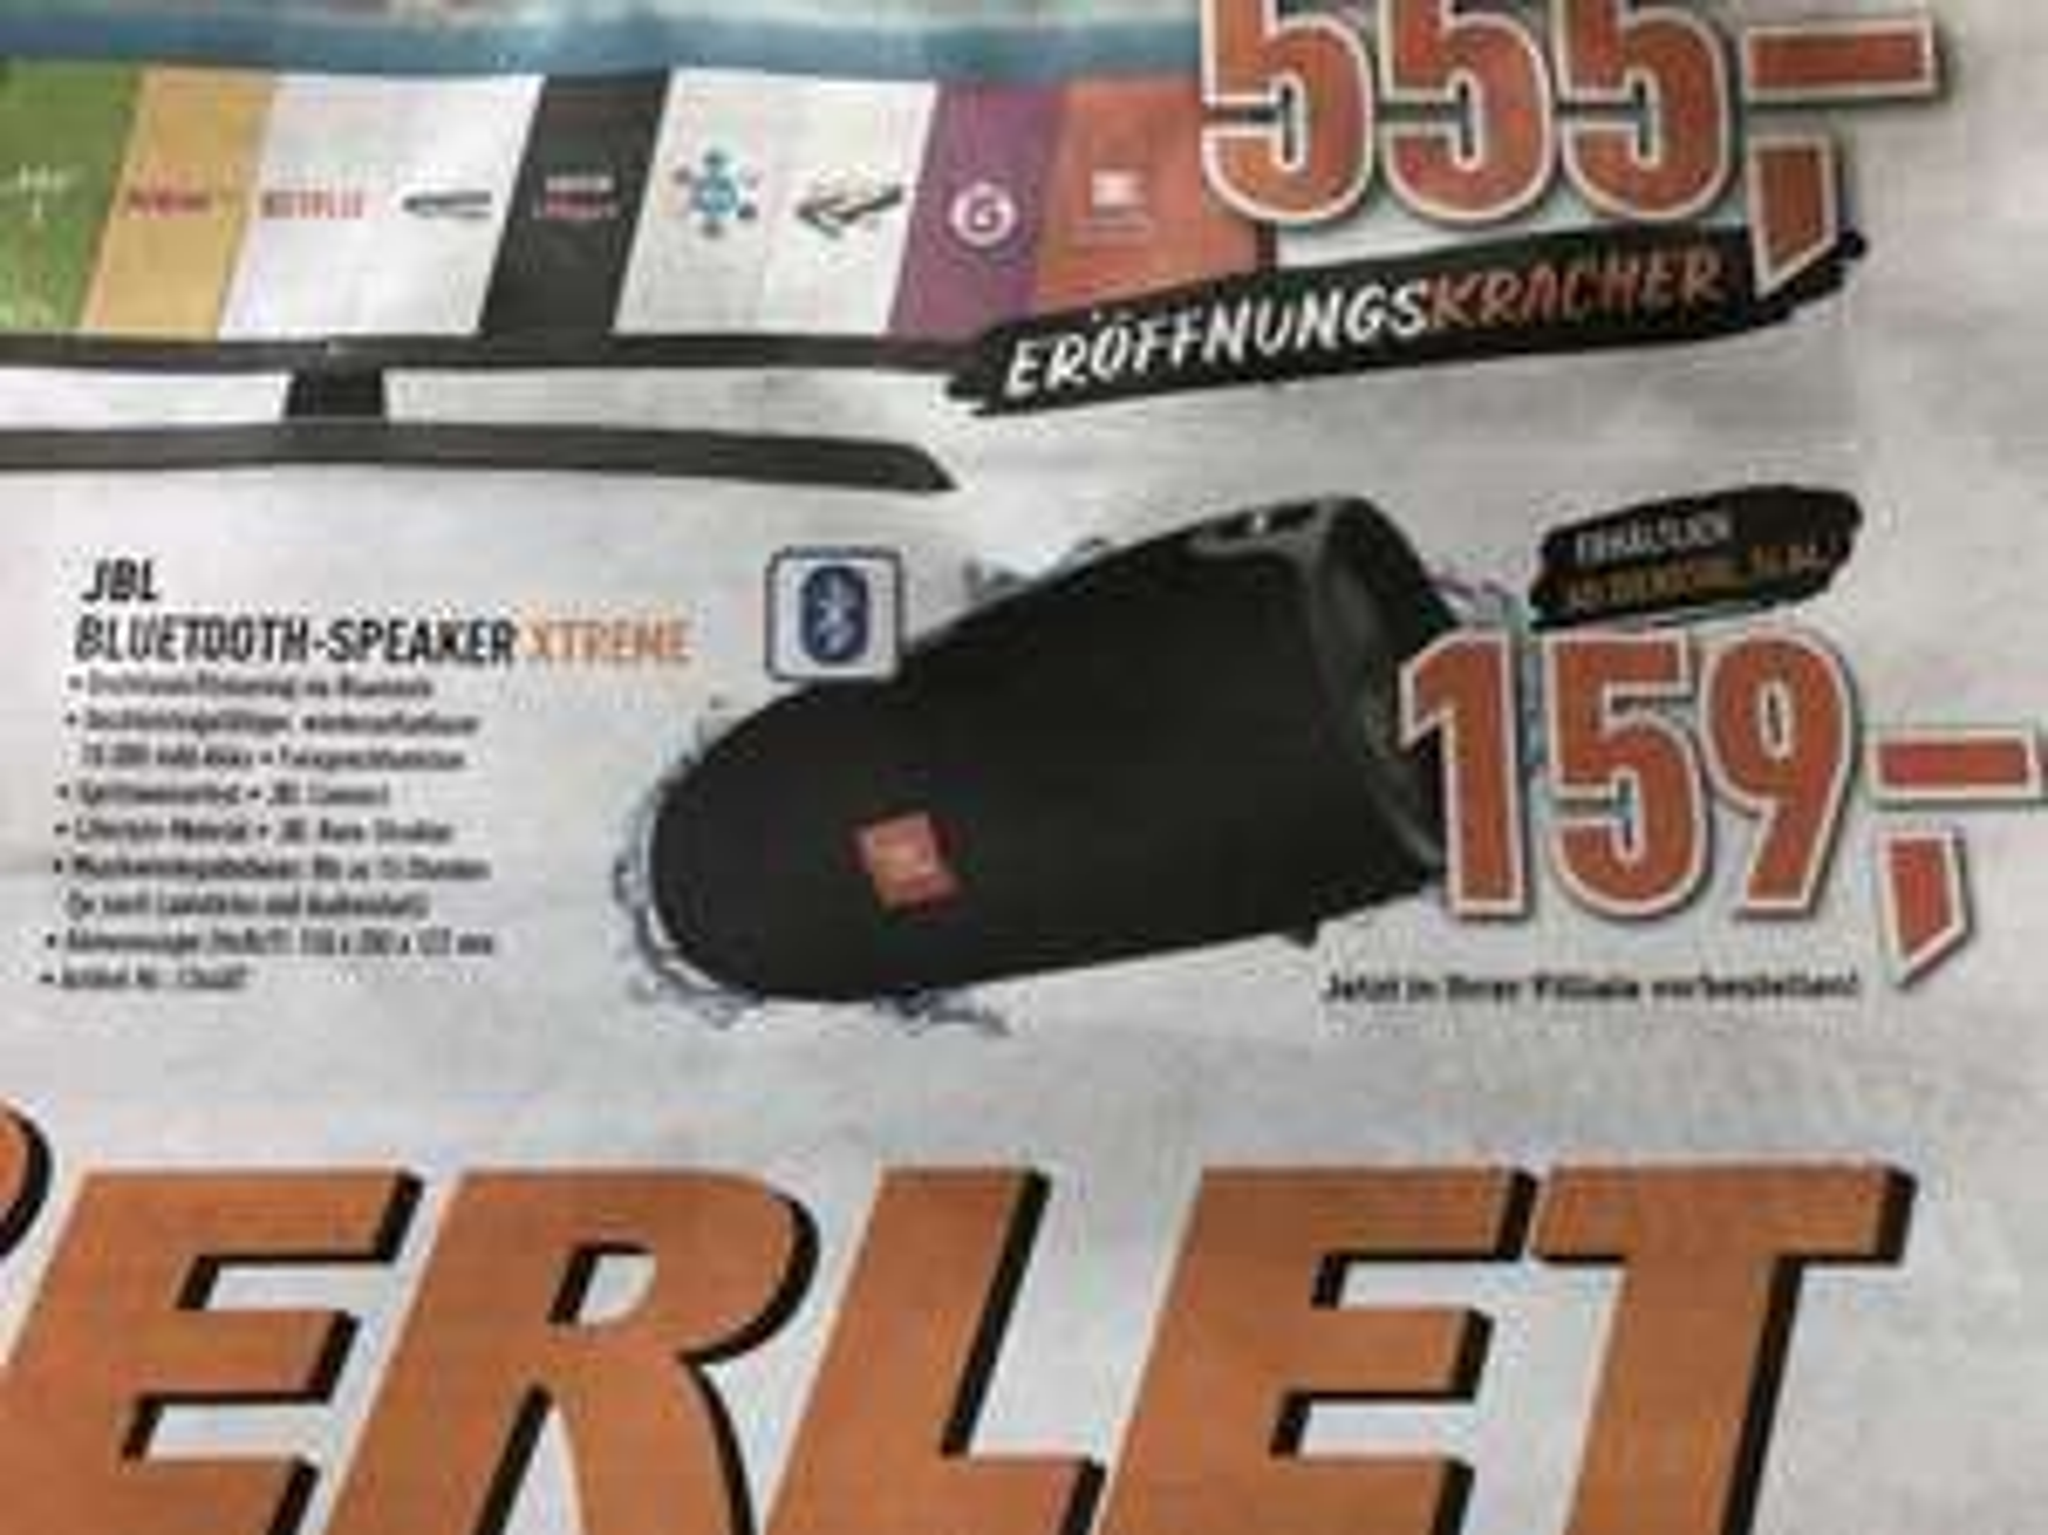 [BERLET, on+offline] JBL Xtreme Bluetooth-Speaker